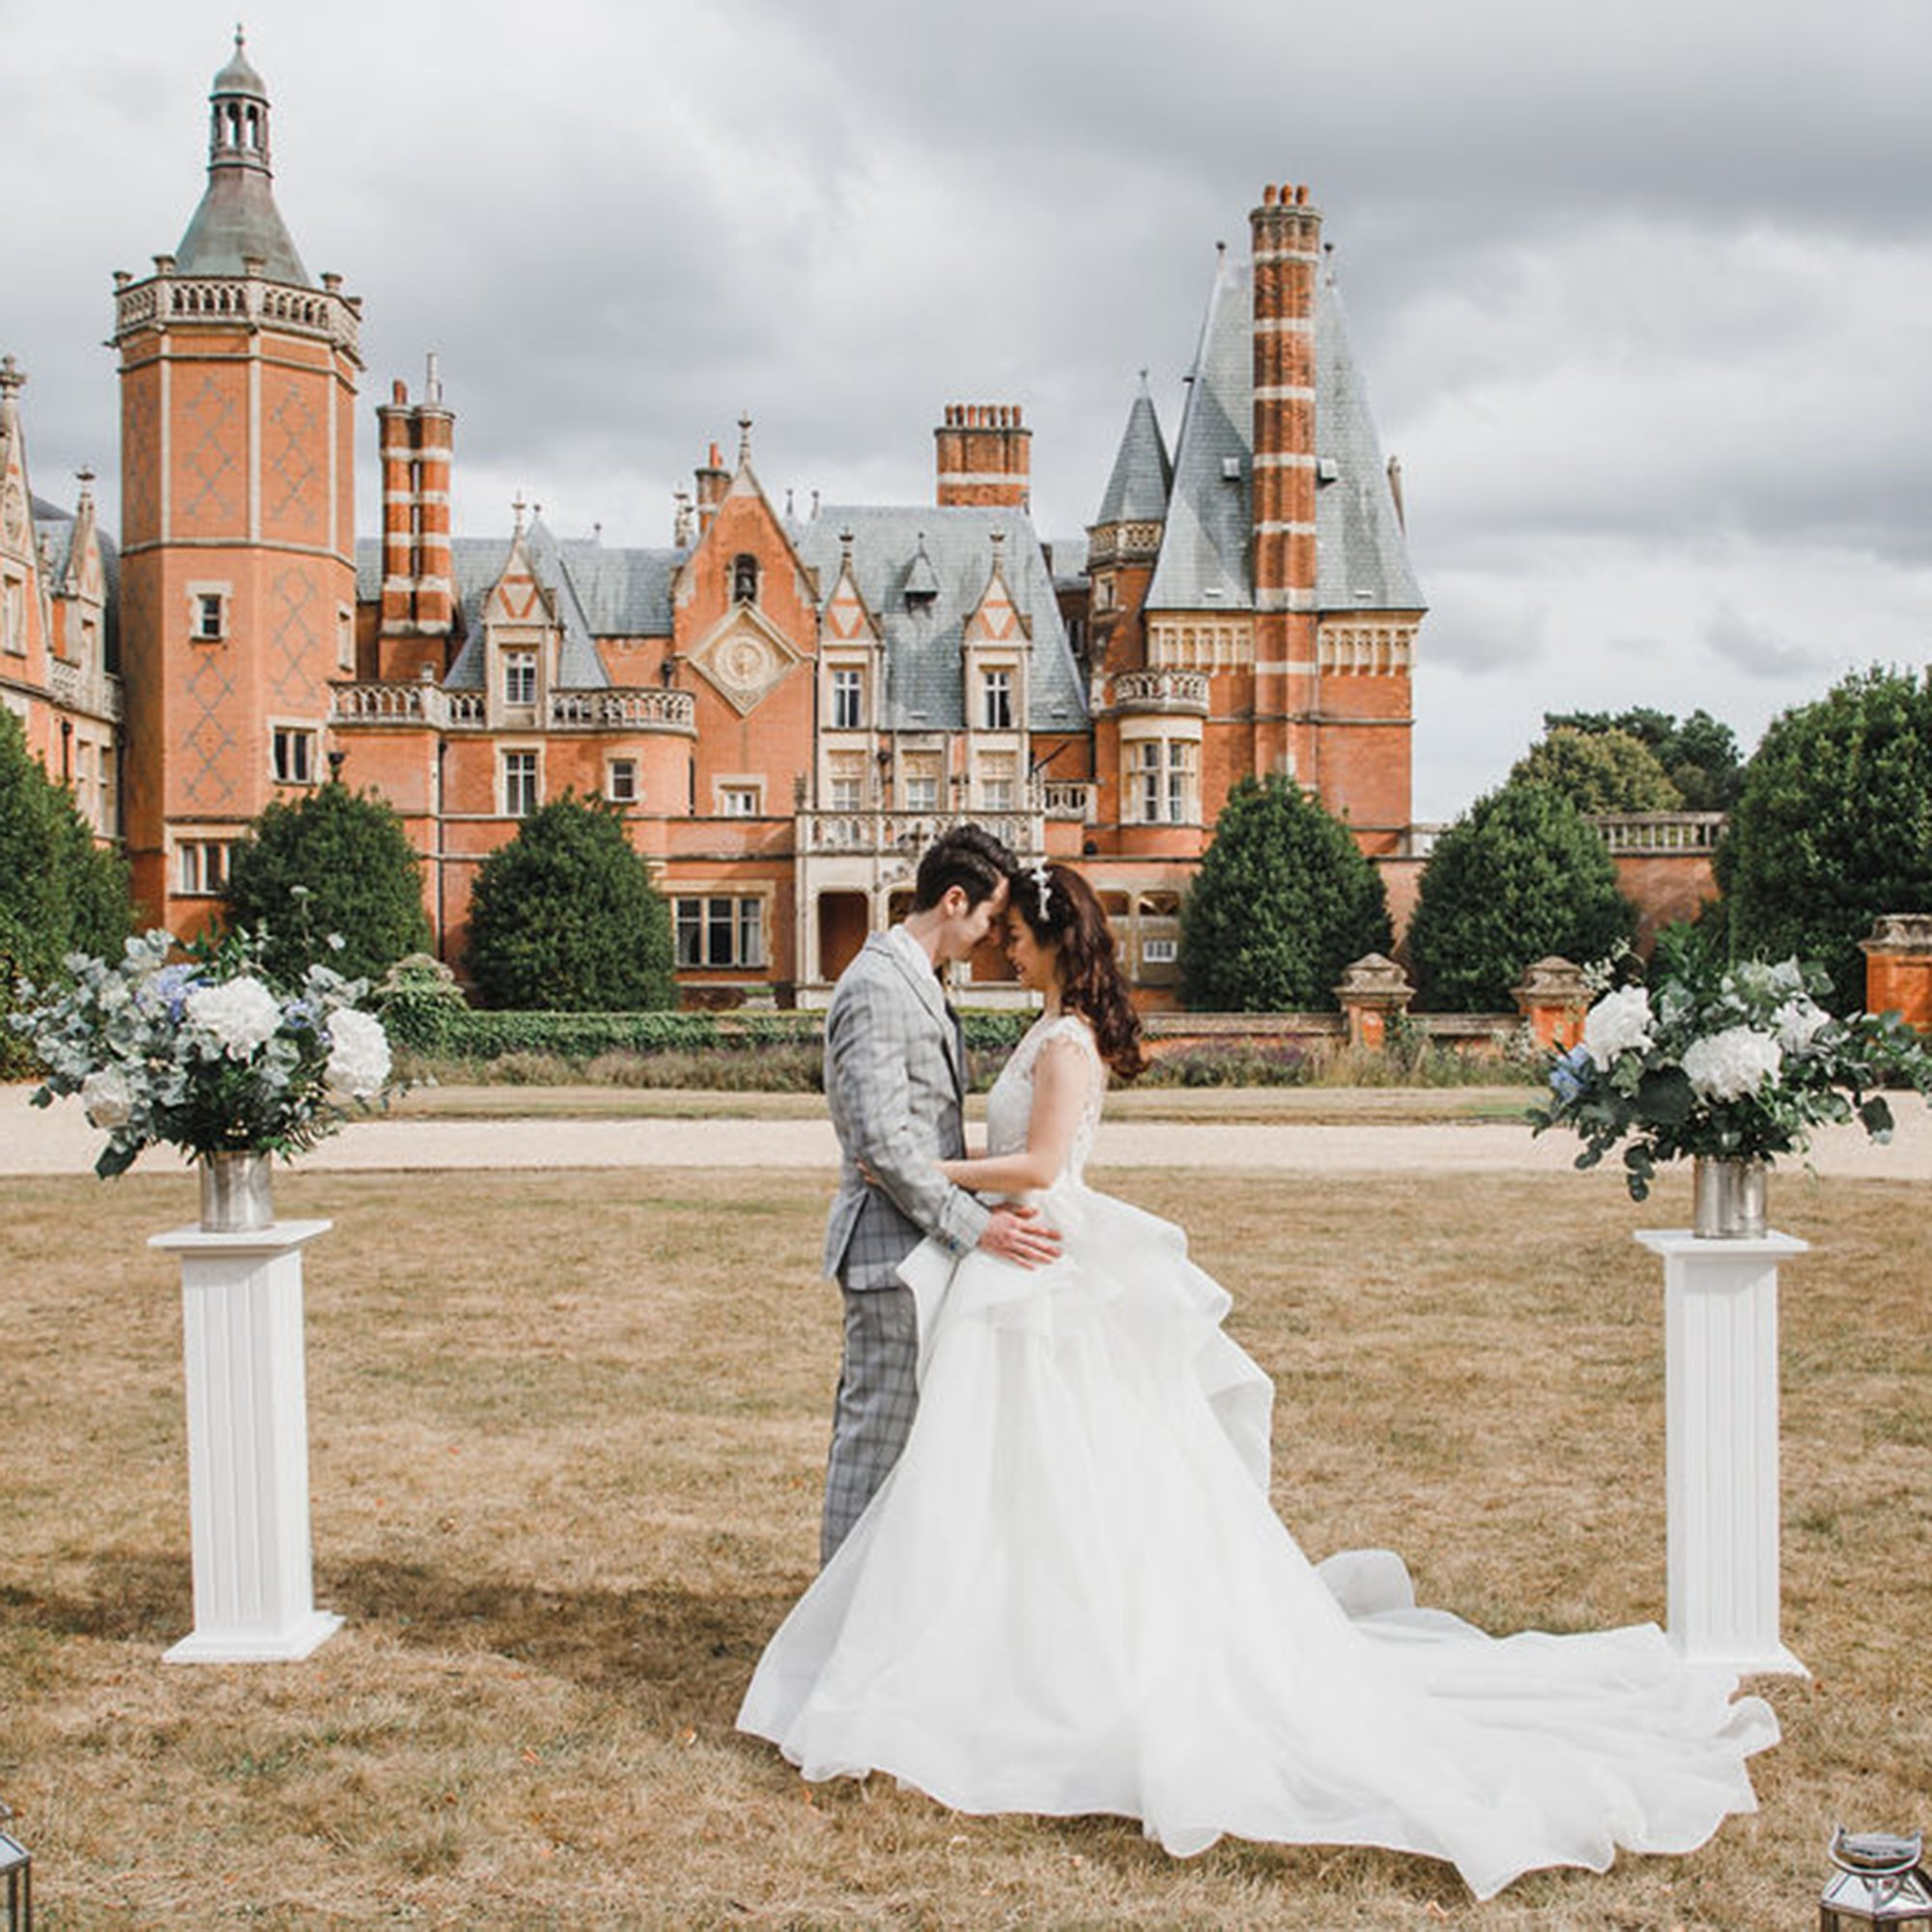 Blue and Blush Wedding Inspiration, Flamboyant Invites